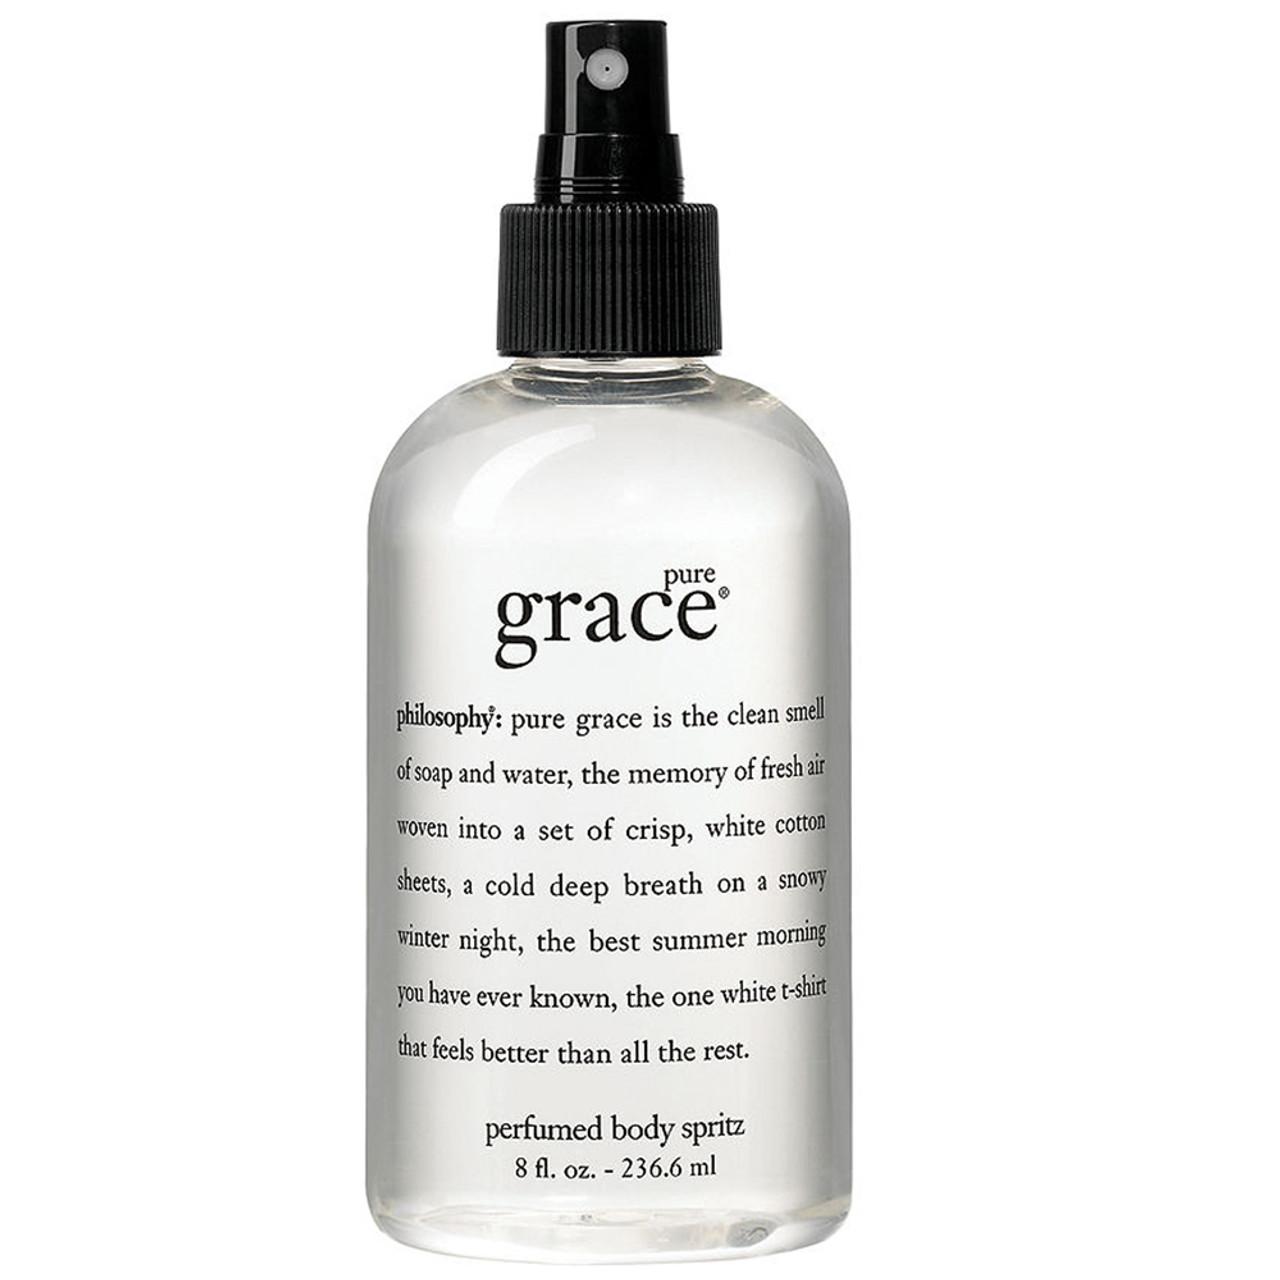 philosophy Pure Grace Perfumed Body Spritz BeautifiedYou.com